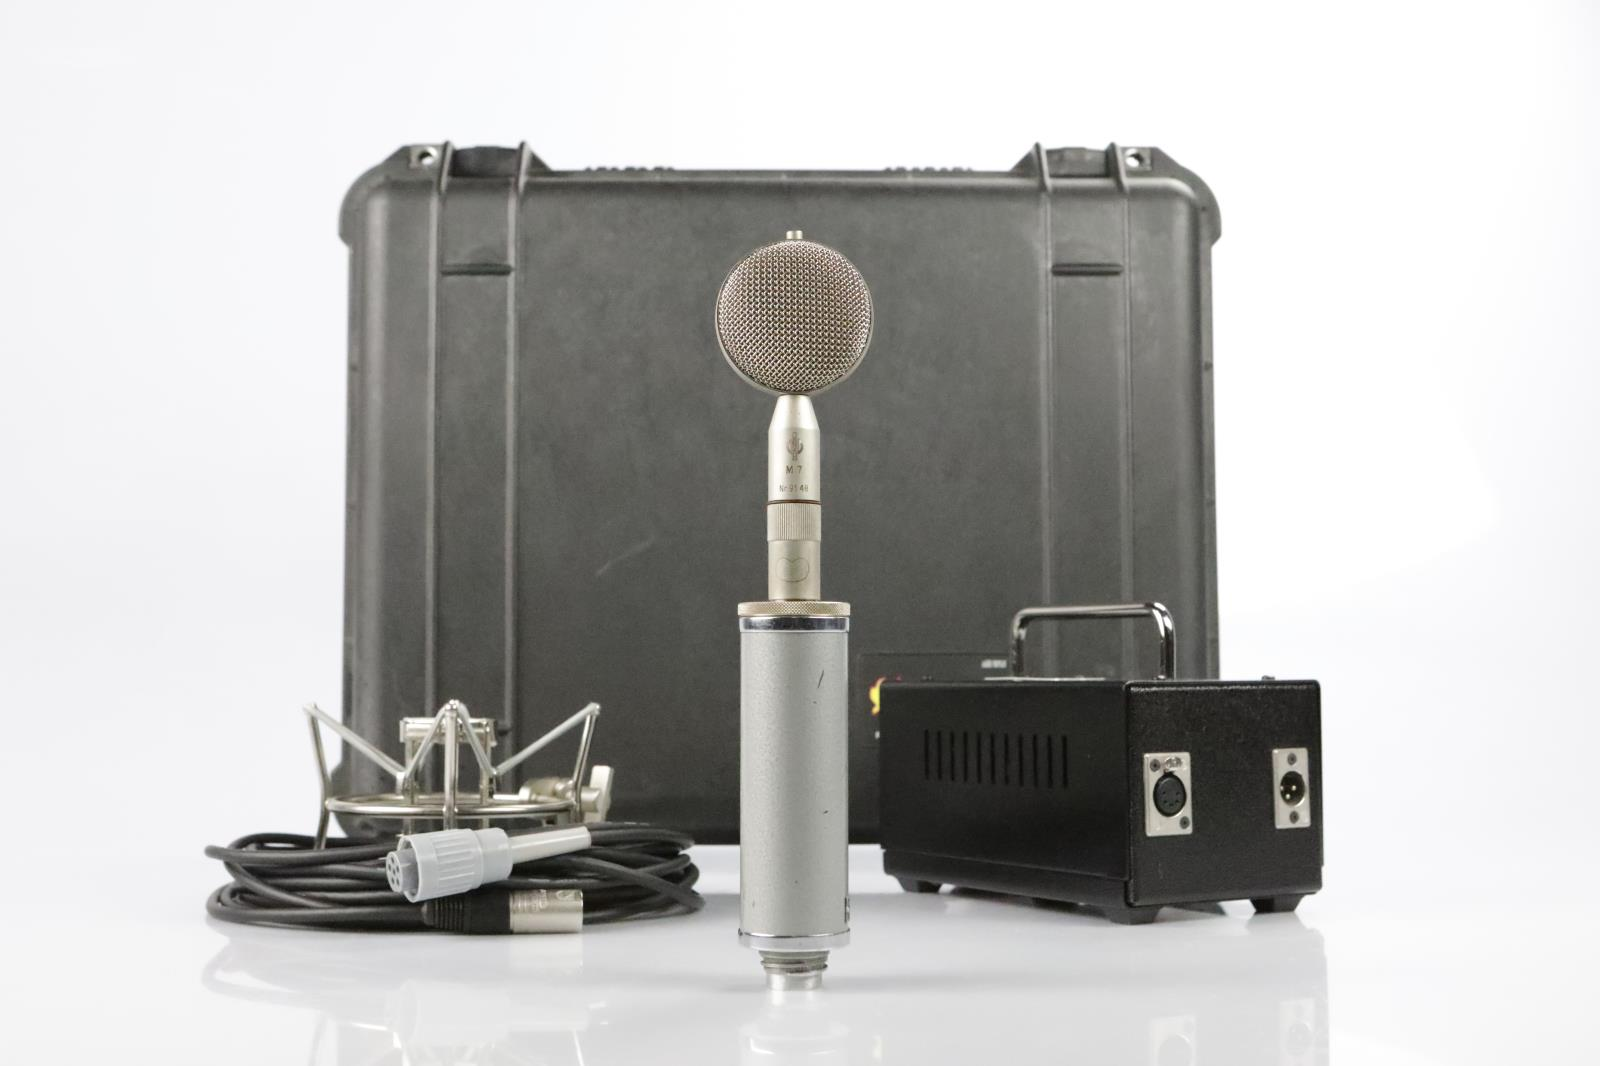 Neumann Gefell CMV-551 Microphone M7 Capsule Tube Mic w Pelican 1550 Case #34248